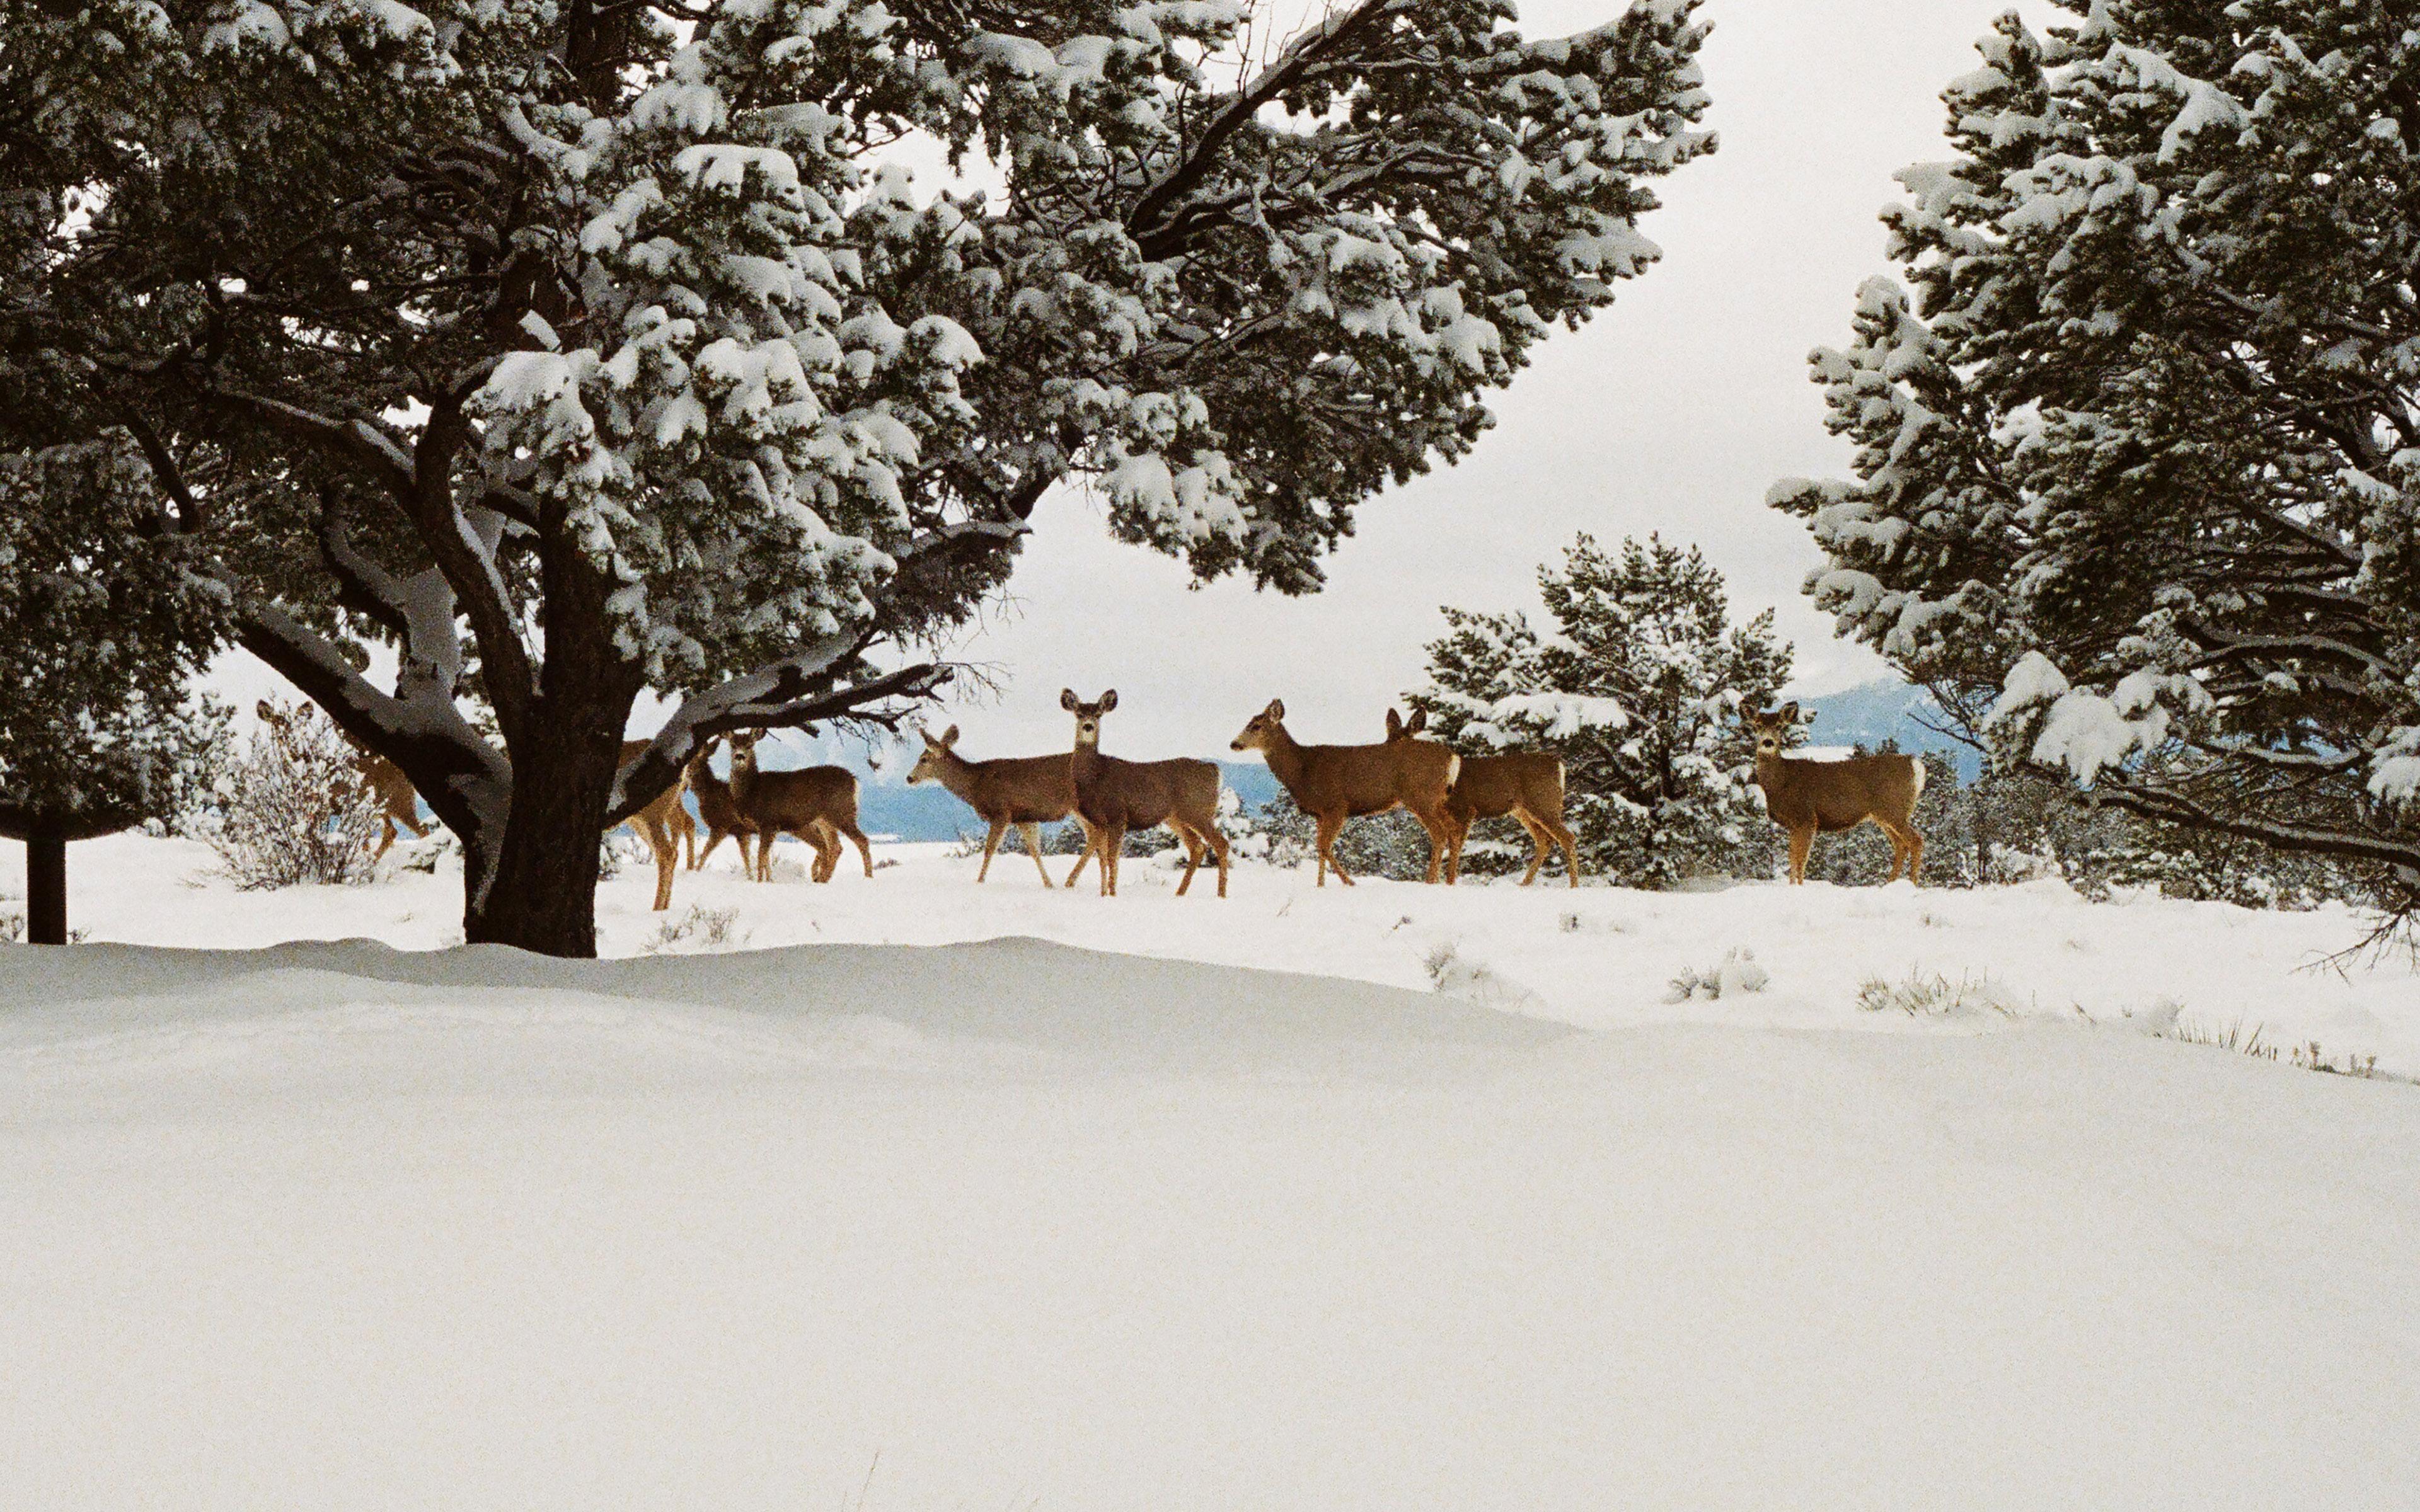 wallpaper for desktop, laptop | mj27-snow-deer-winter ...